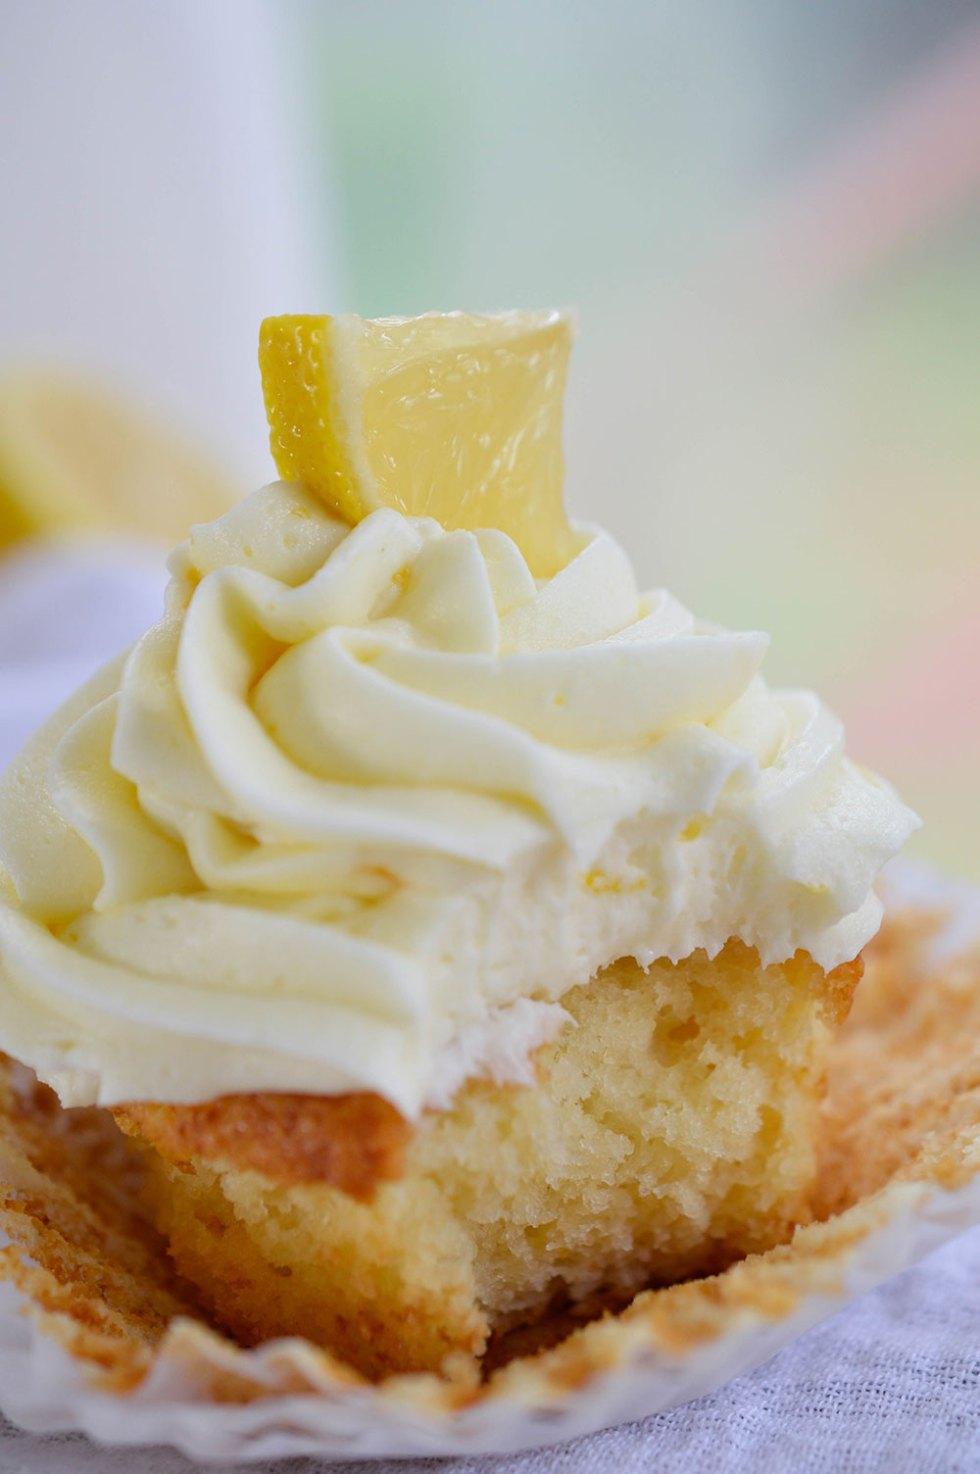 Easy Lemon Cupcakes made with Lemon Crème pie filling. A quick and easy lemon dessert!